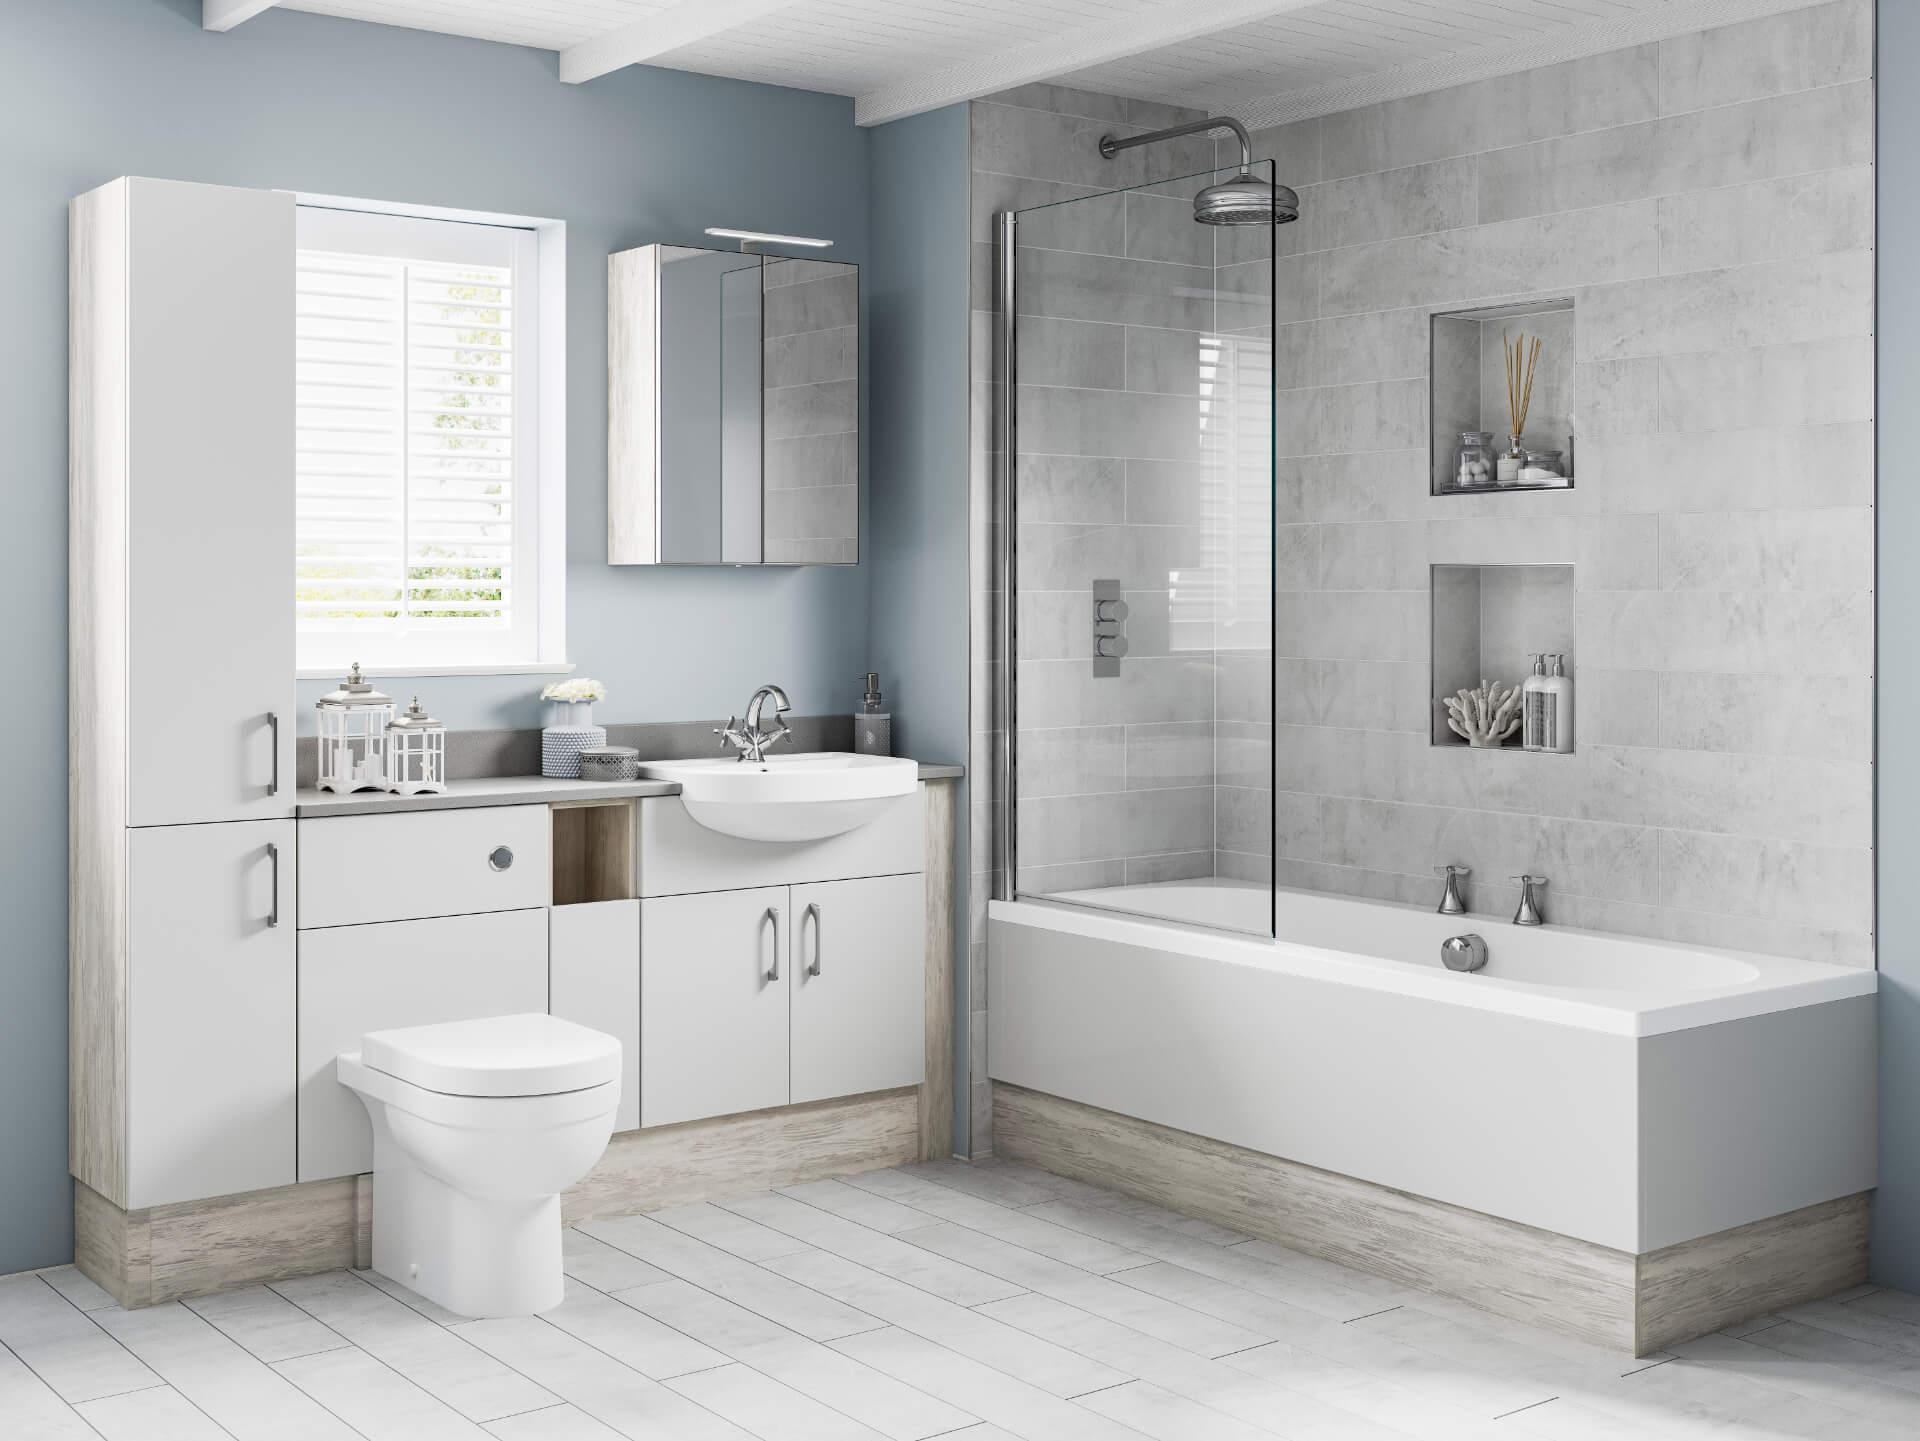 Nolte Original Fitted White Bathroom